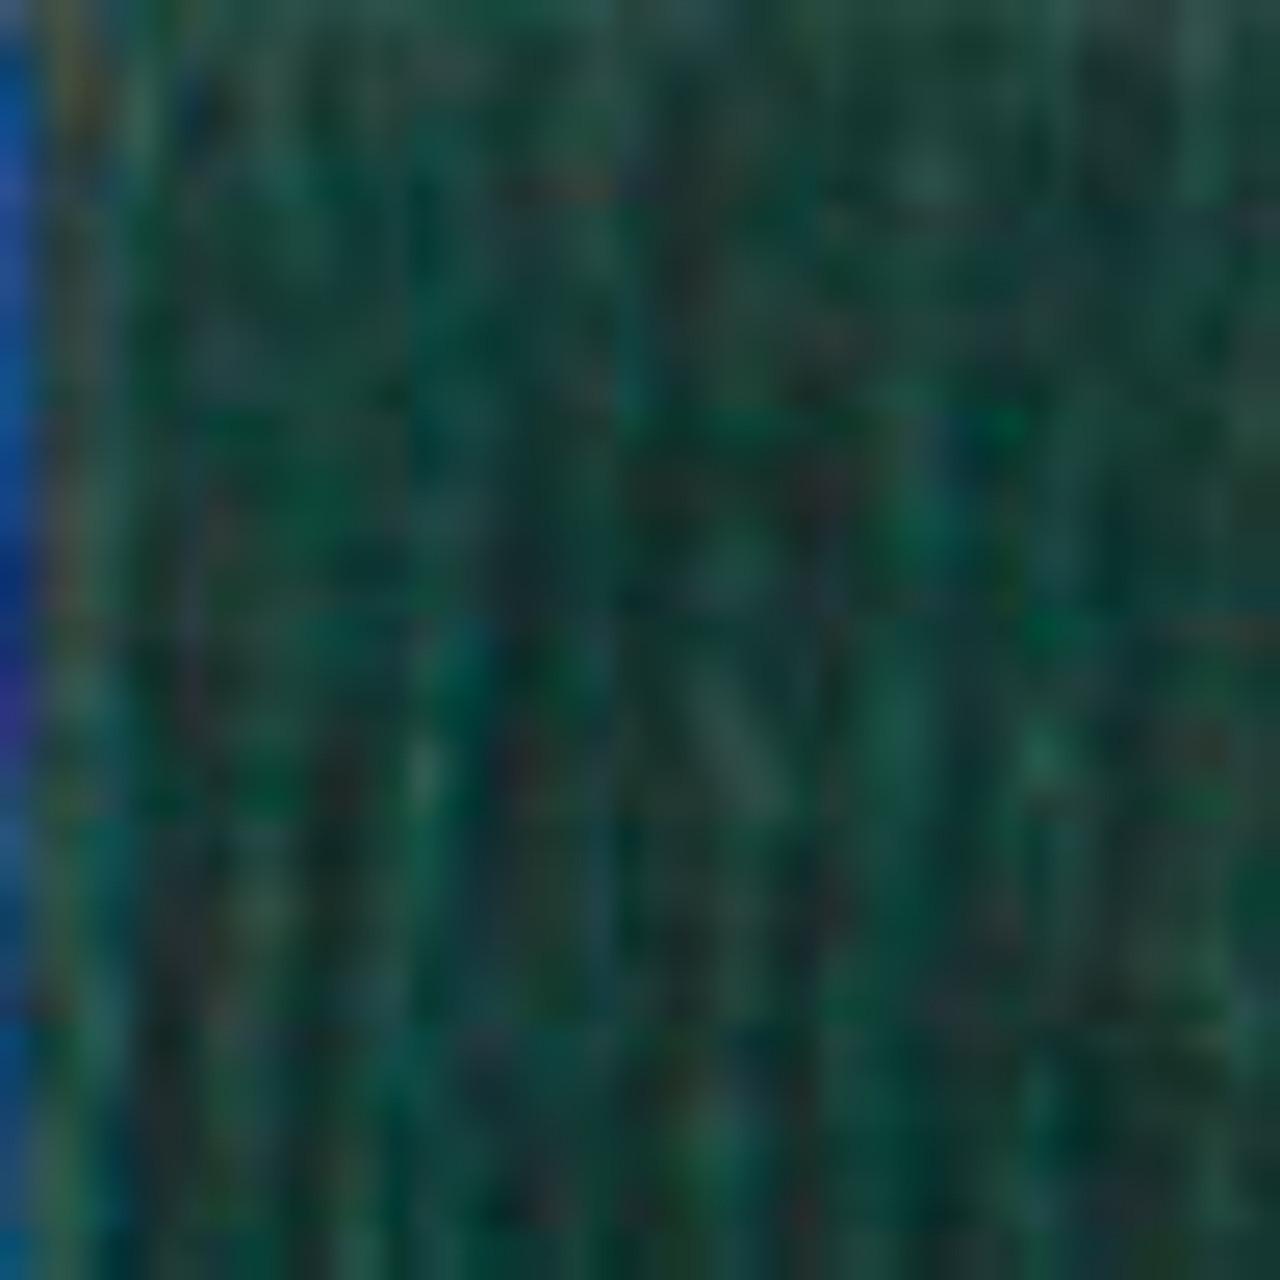 DMC # 500 Very Dark Blue Green Floss / Thread